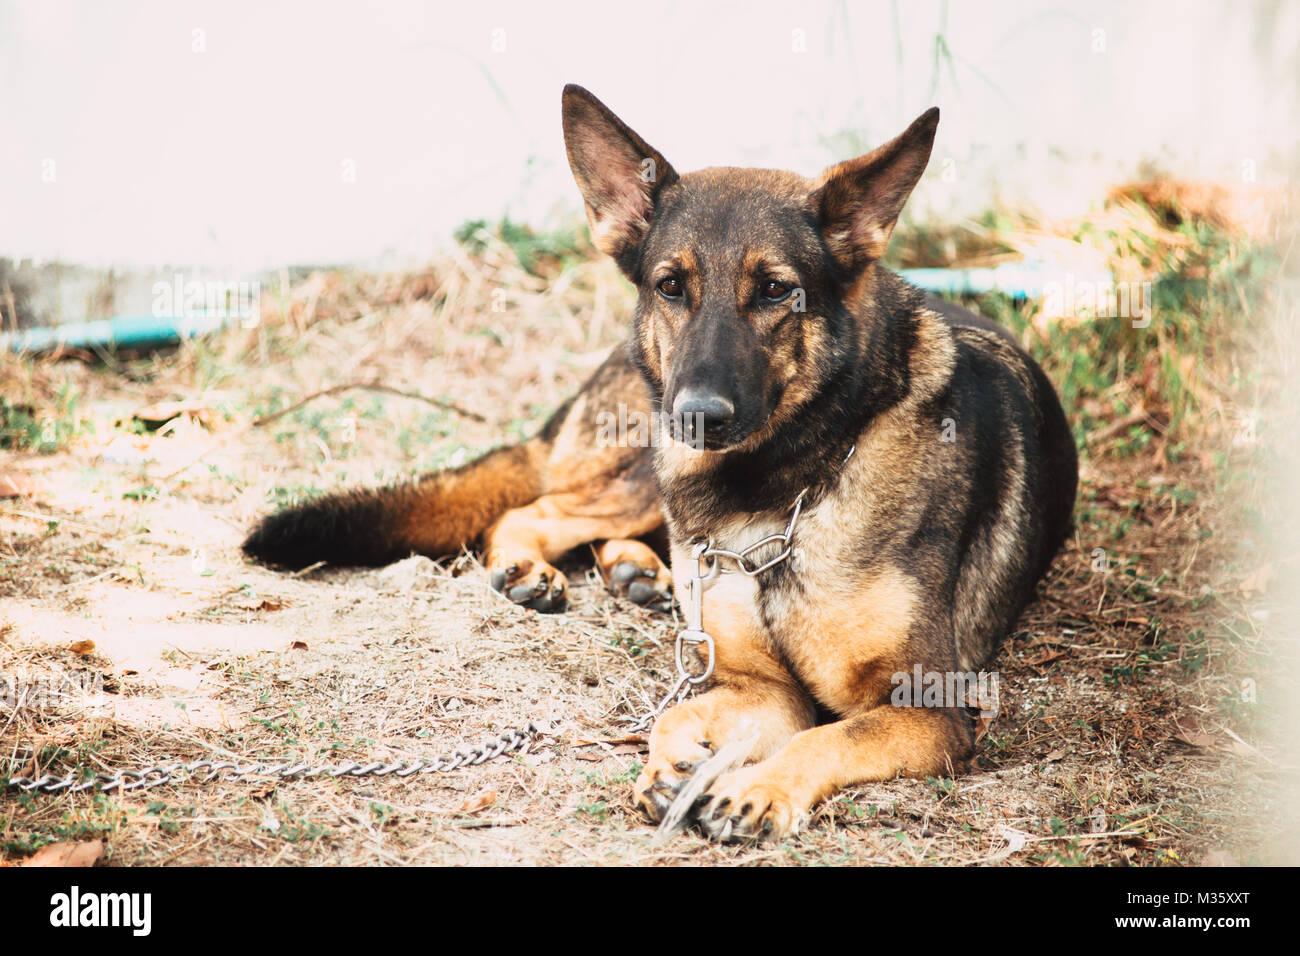 German Shepherd Dog K 9 Military Soldier Alsatian Dog Serious Face